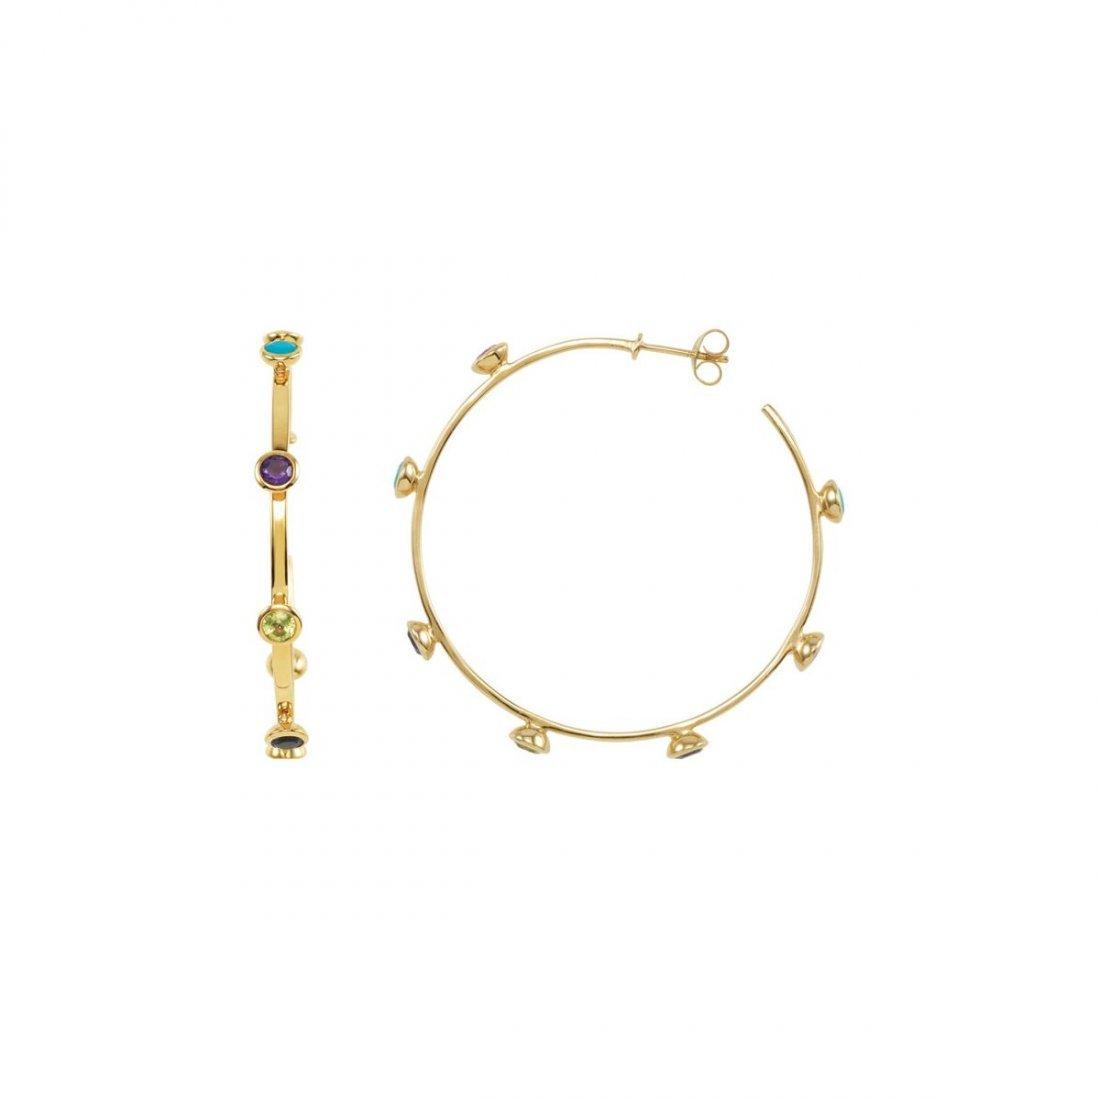 Earrings - 18K Vermeil Pink Tourmaline, Turquoise,